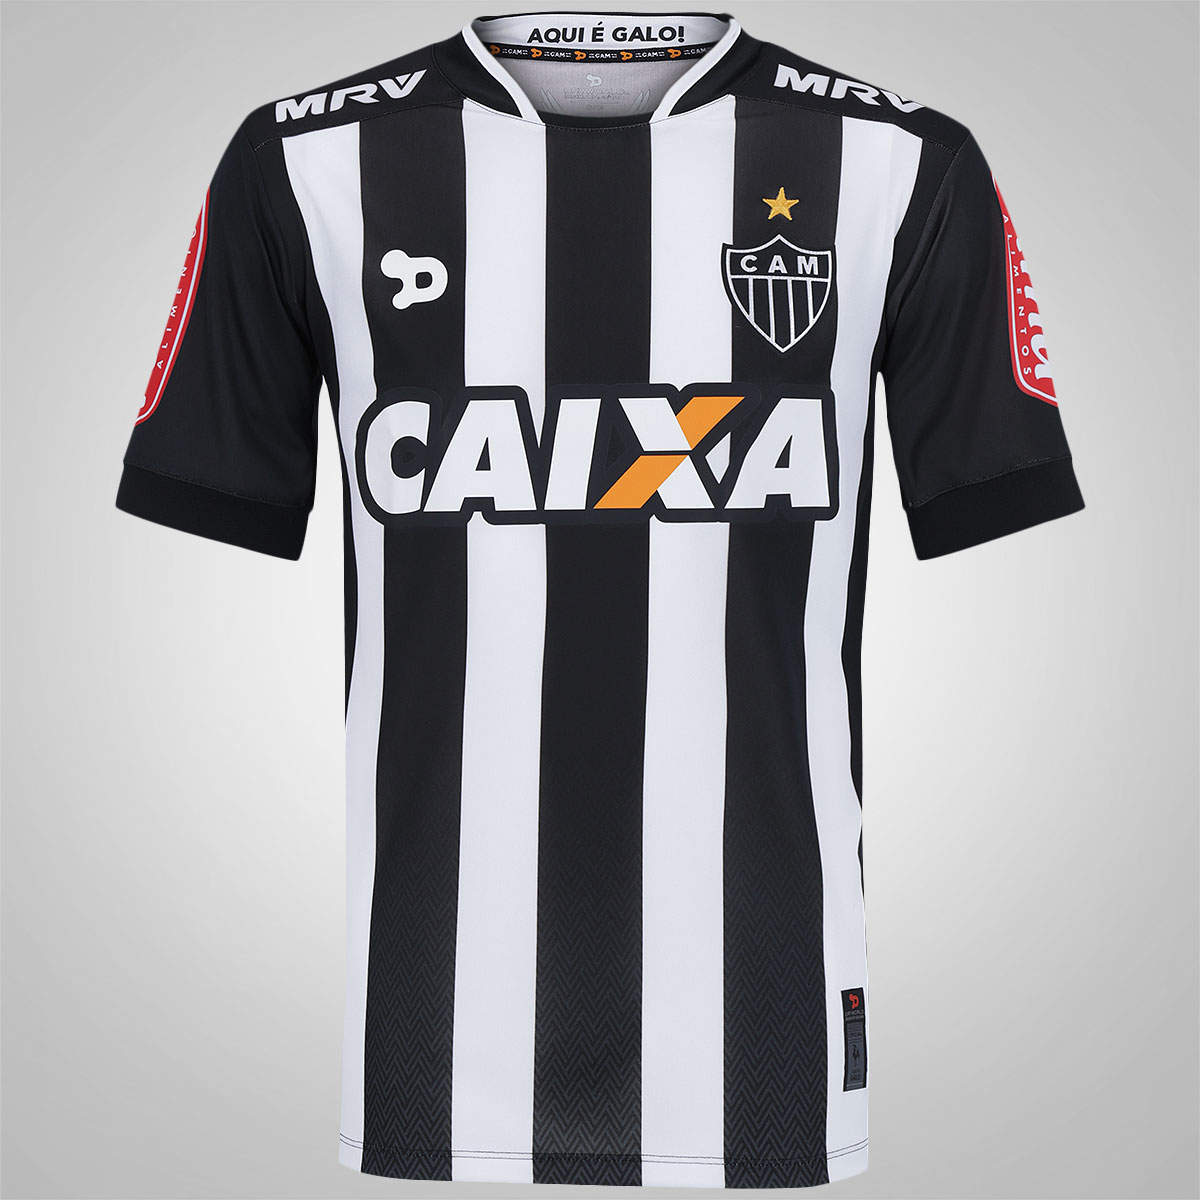 Camisa Atlético Mineiro Dryworld 2016 Nº9 - Energia Esportes 4d08e64bbe1aa